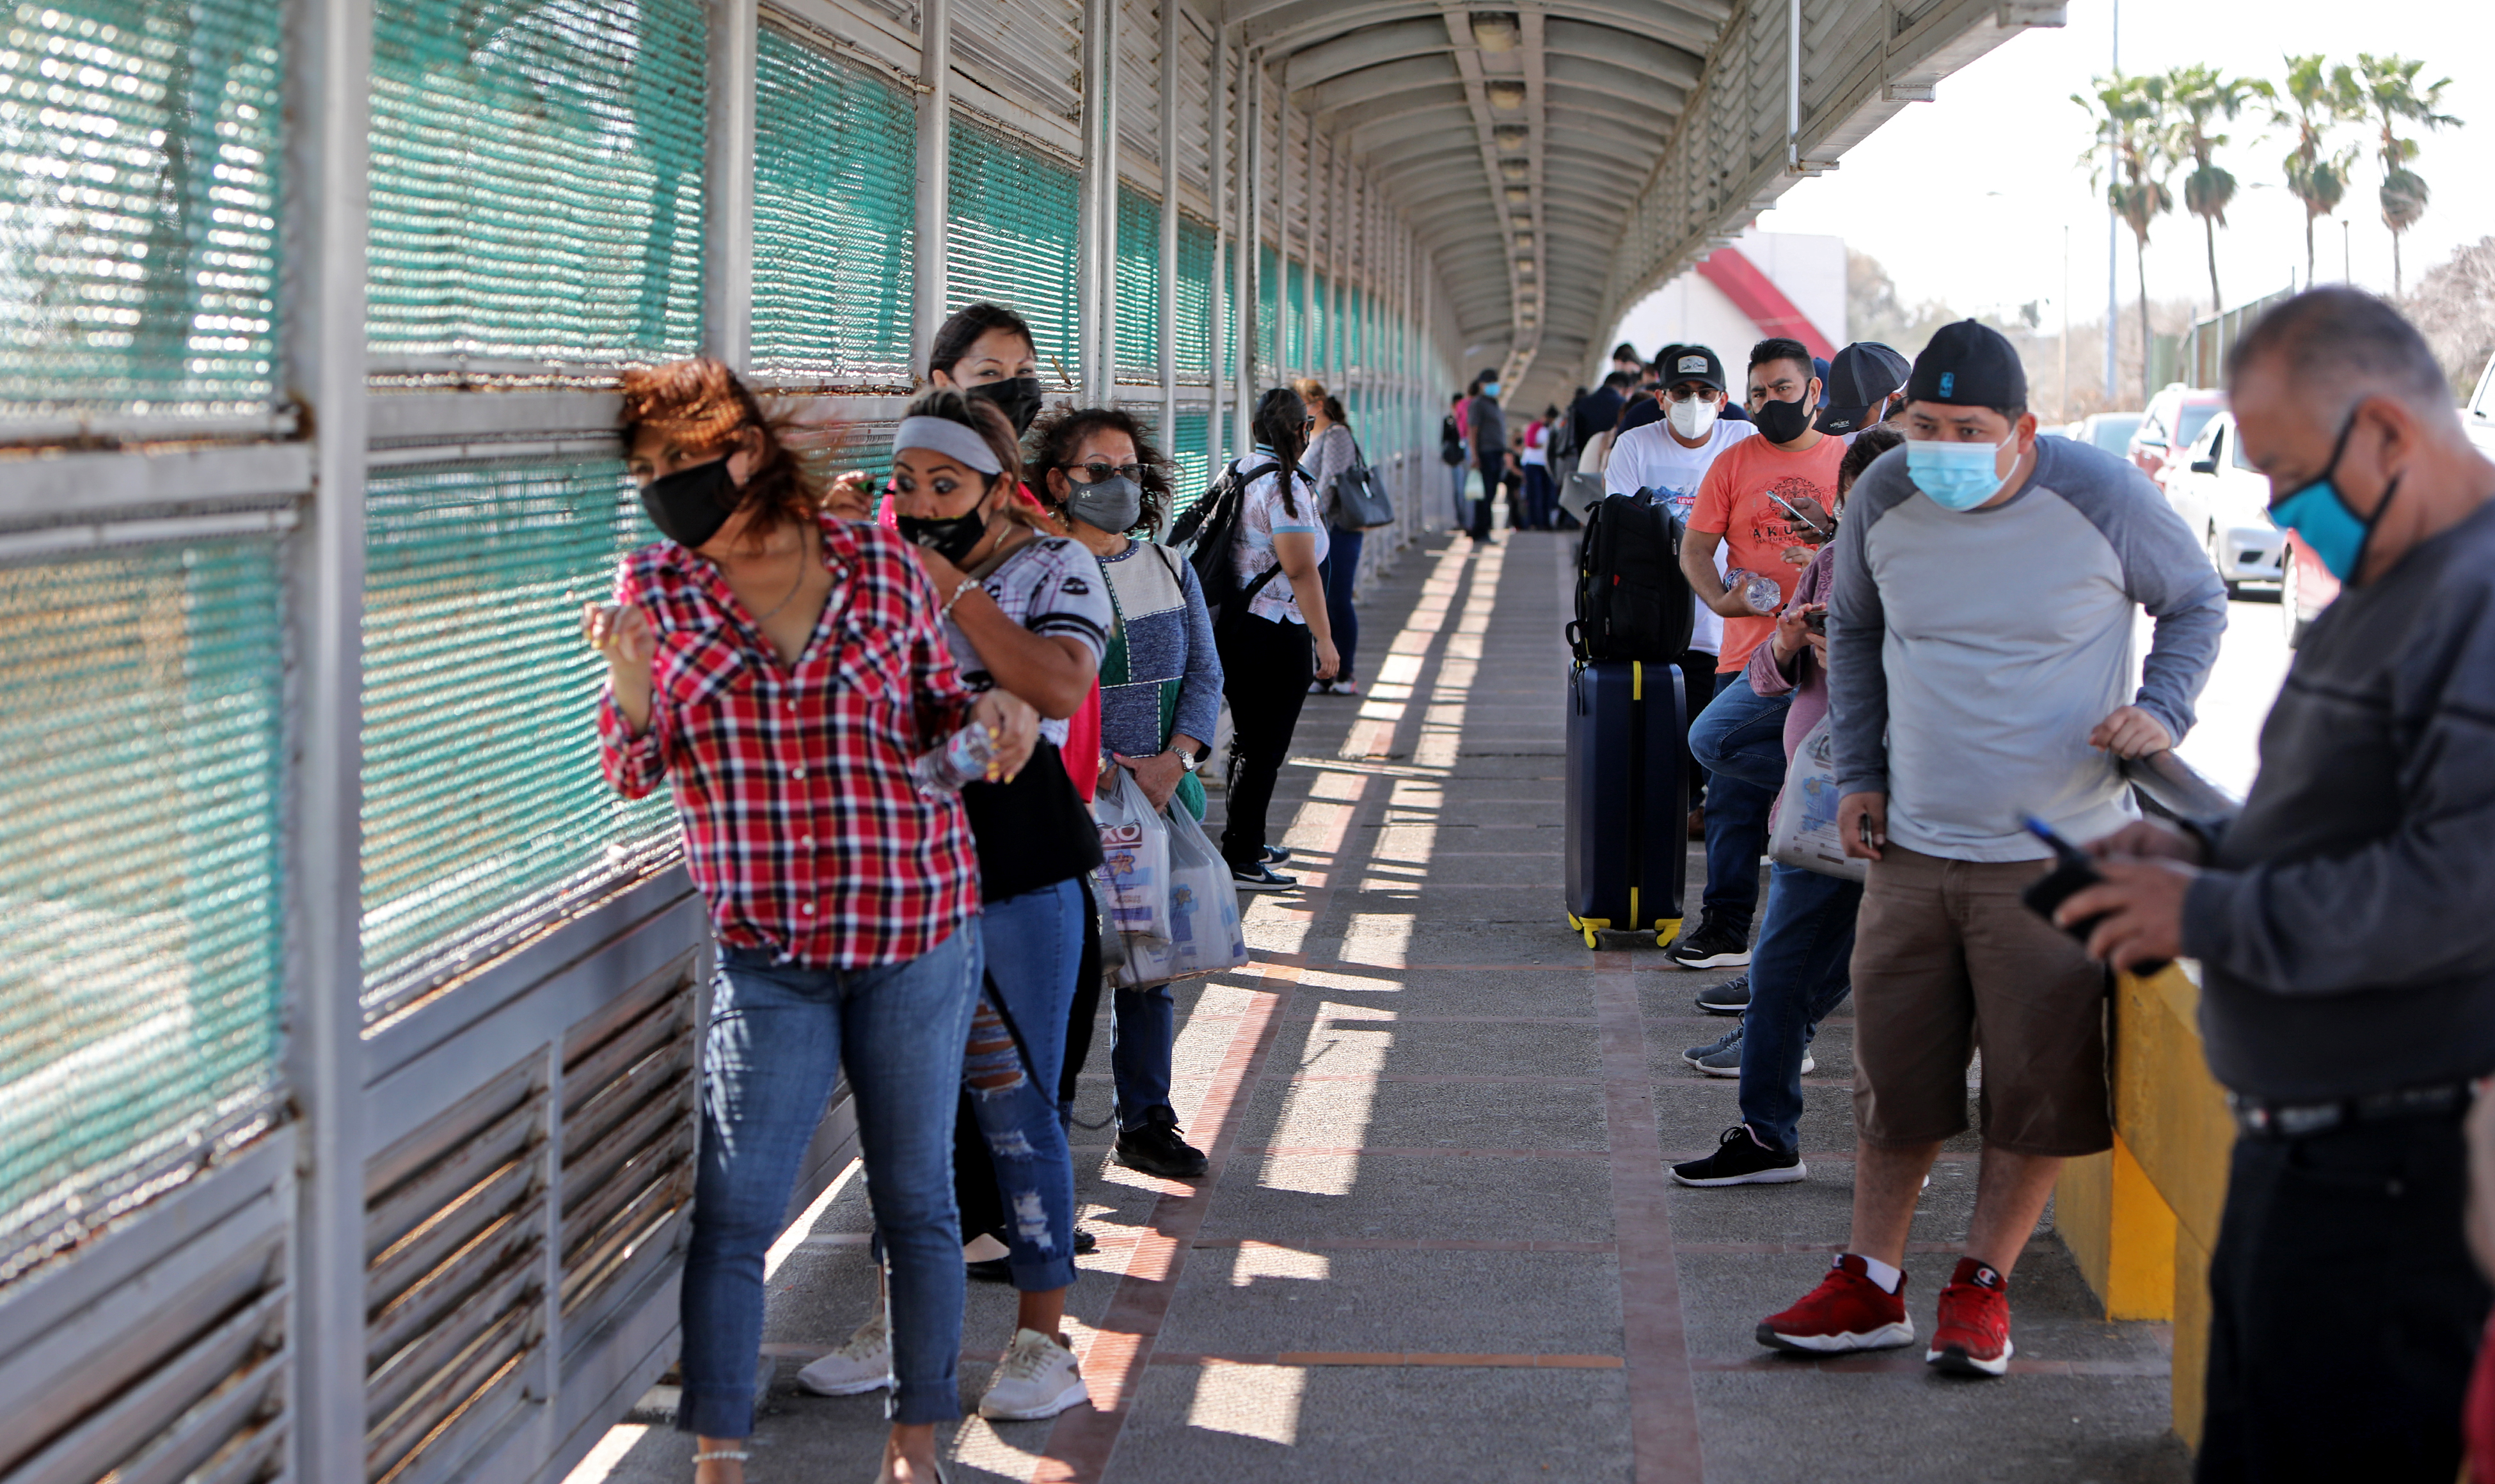 Pedestrians wait in line to cross the Gateway International Bridge from Matamoros, Tamaulipas, Mexico, to Brownsville, Texas, Wednesday, Feb. 24, 2021.